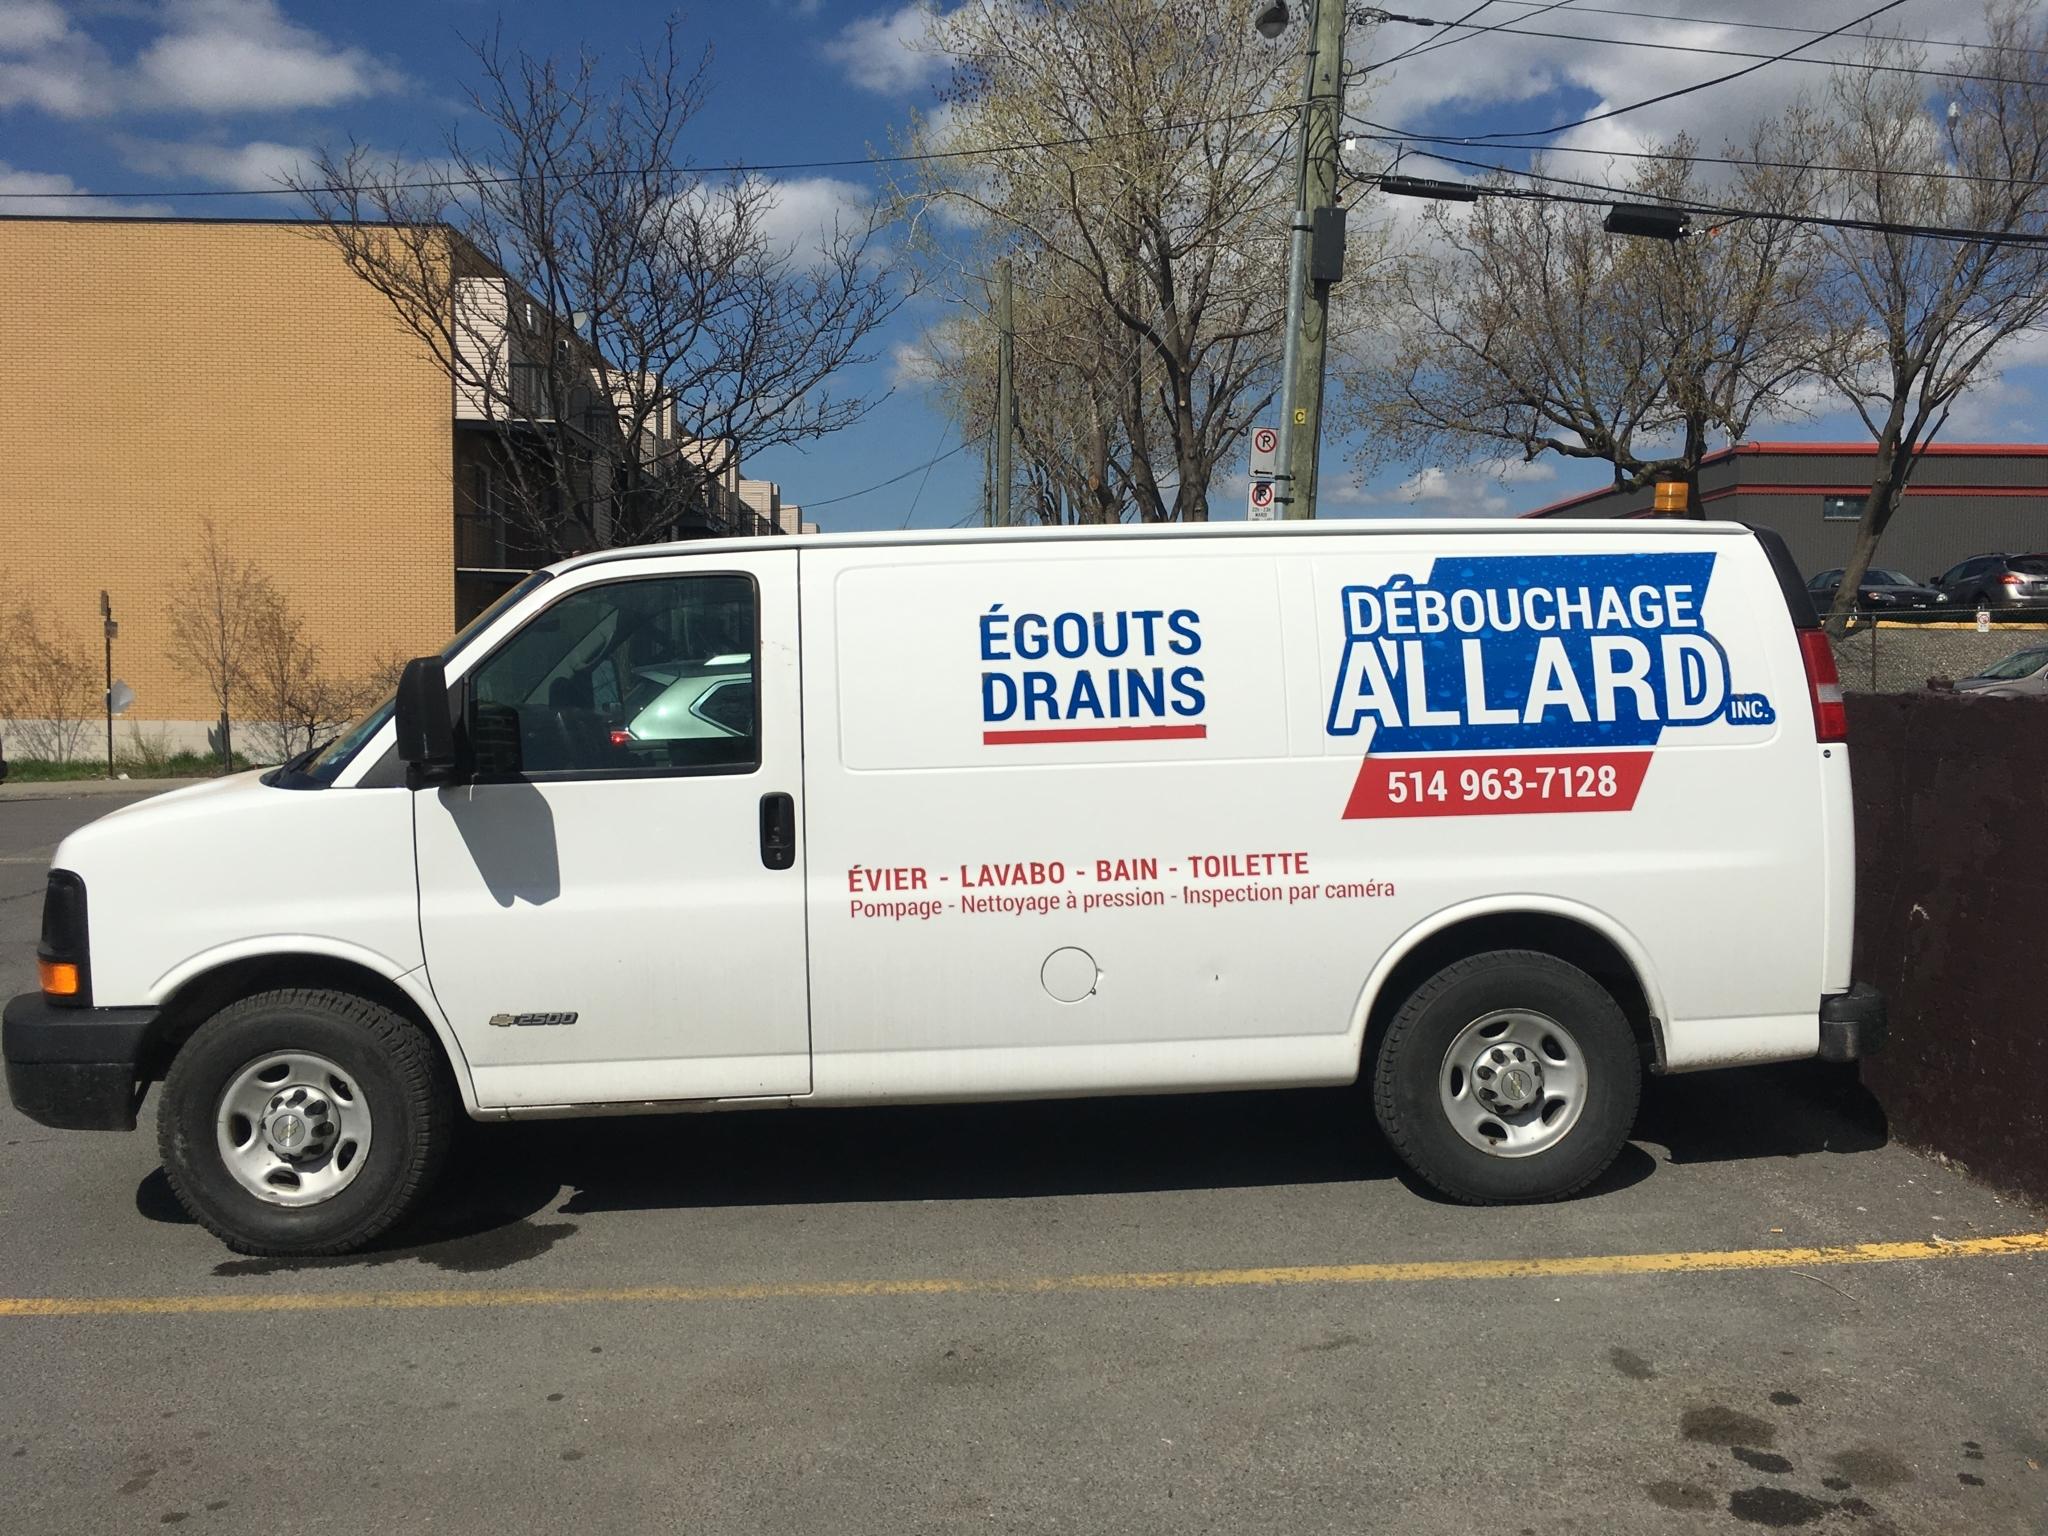 Débouchage Allard in Montréal